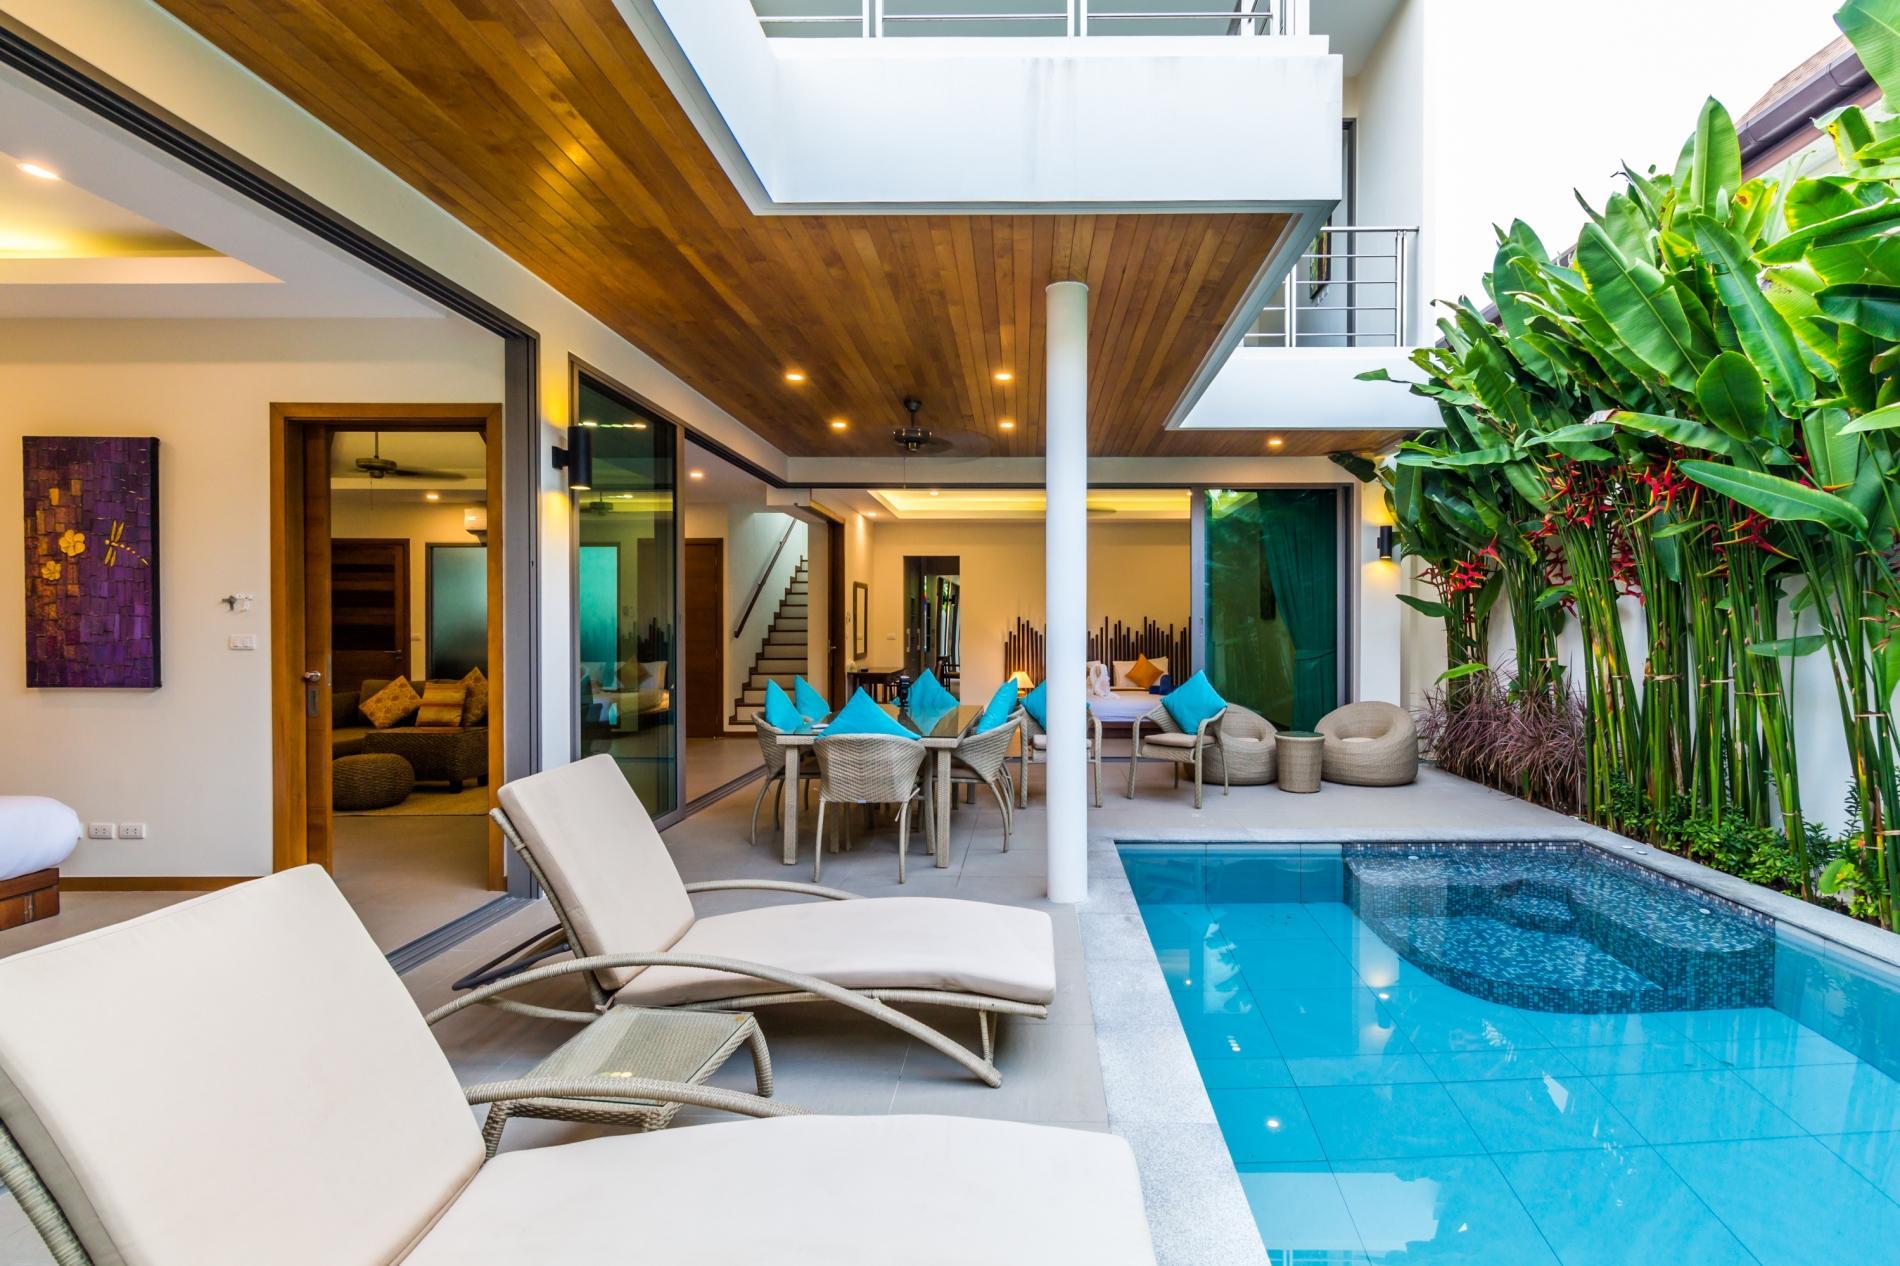 Ka Villa - Private pool villa near seafood market and beach photo 13766463